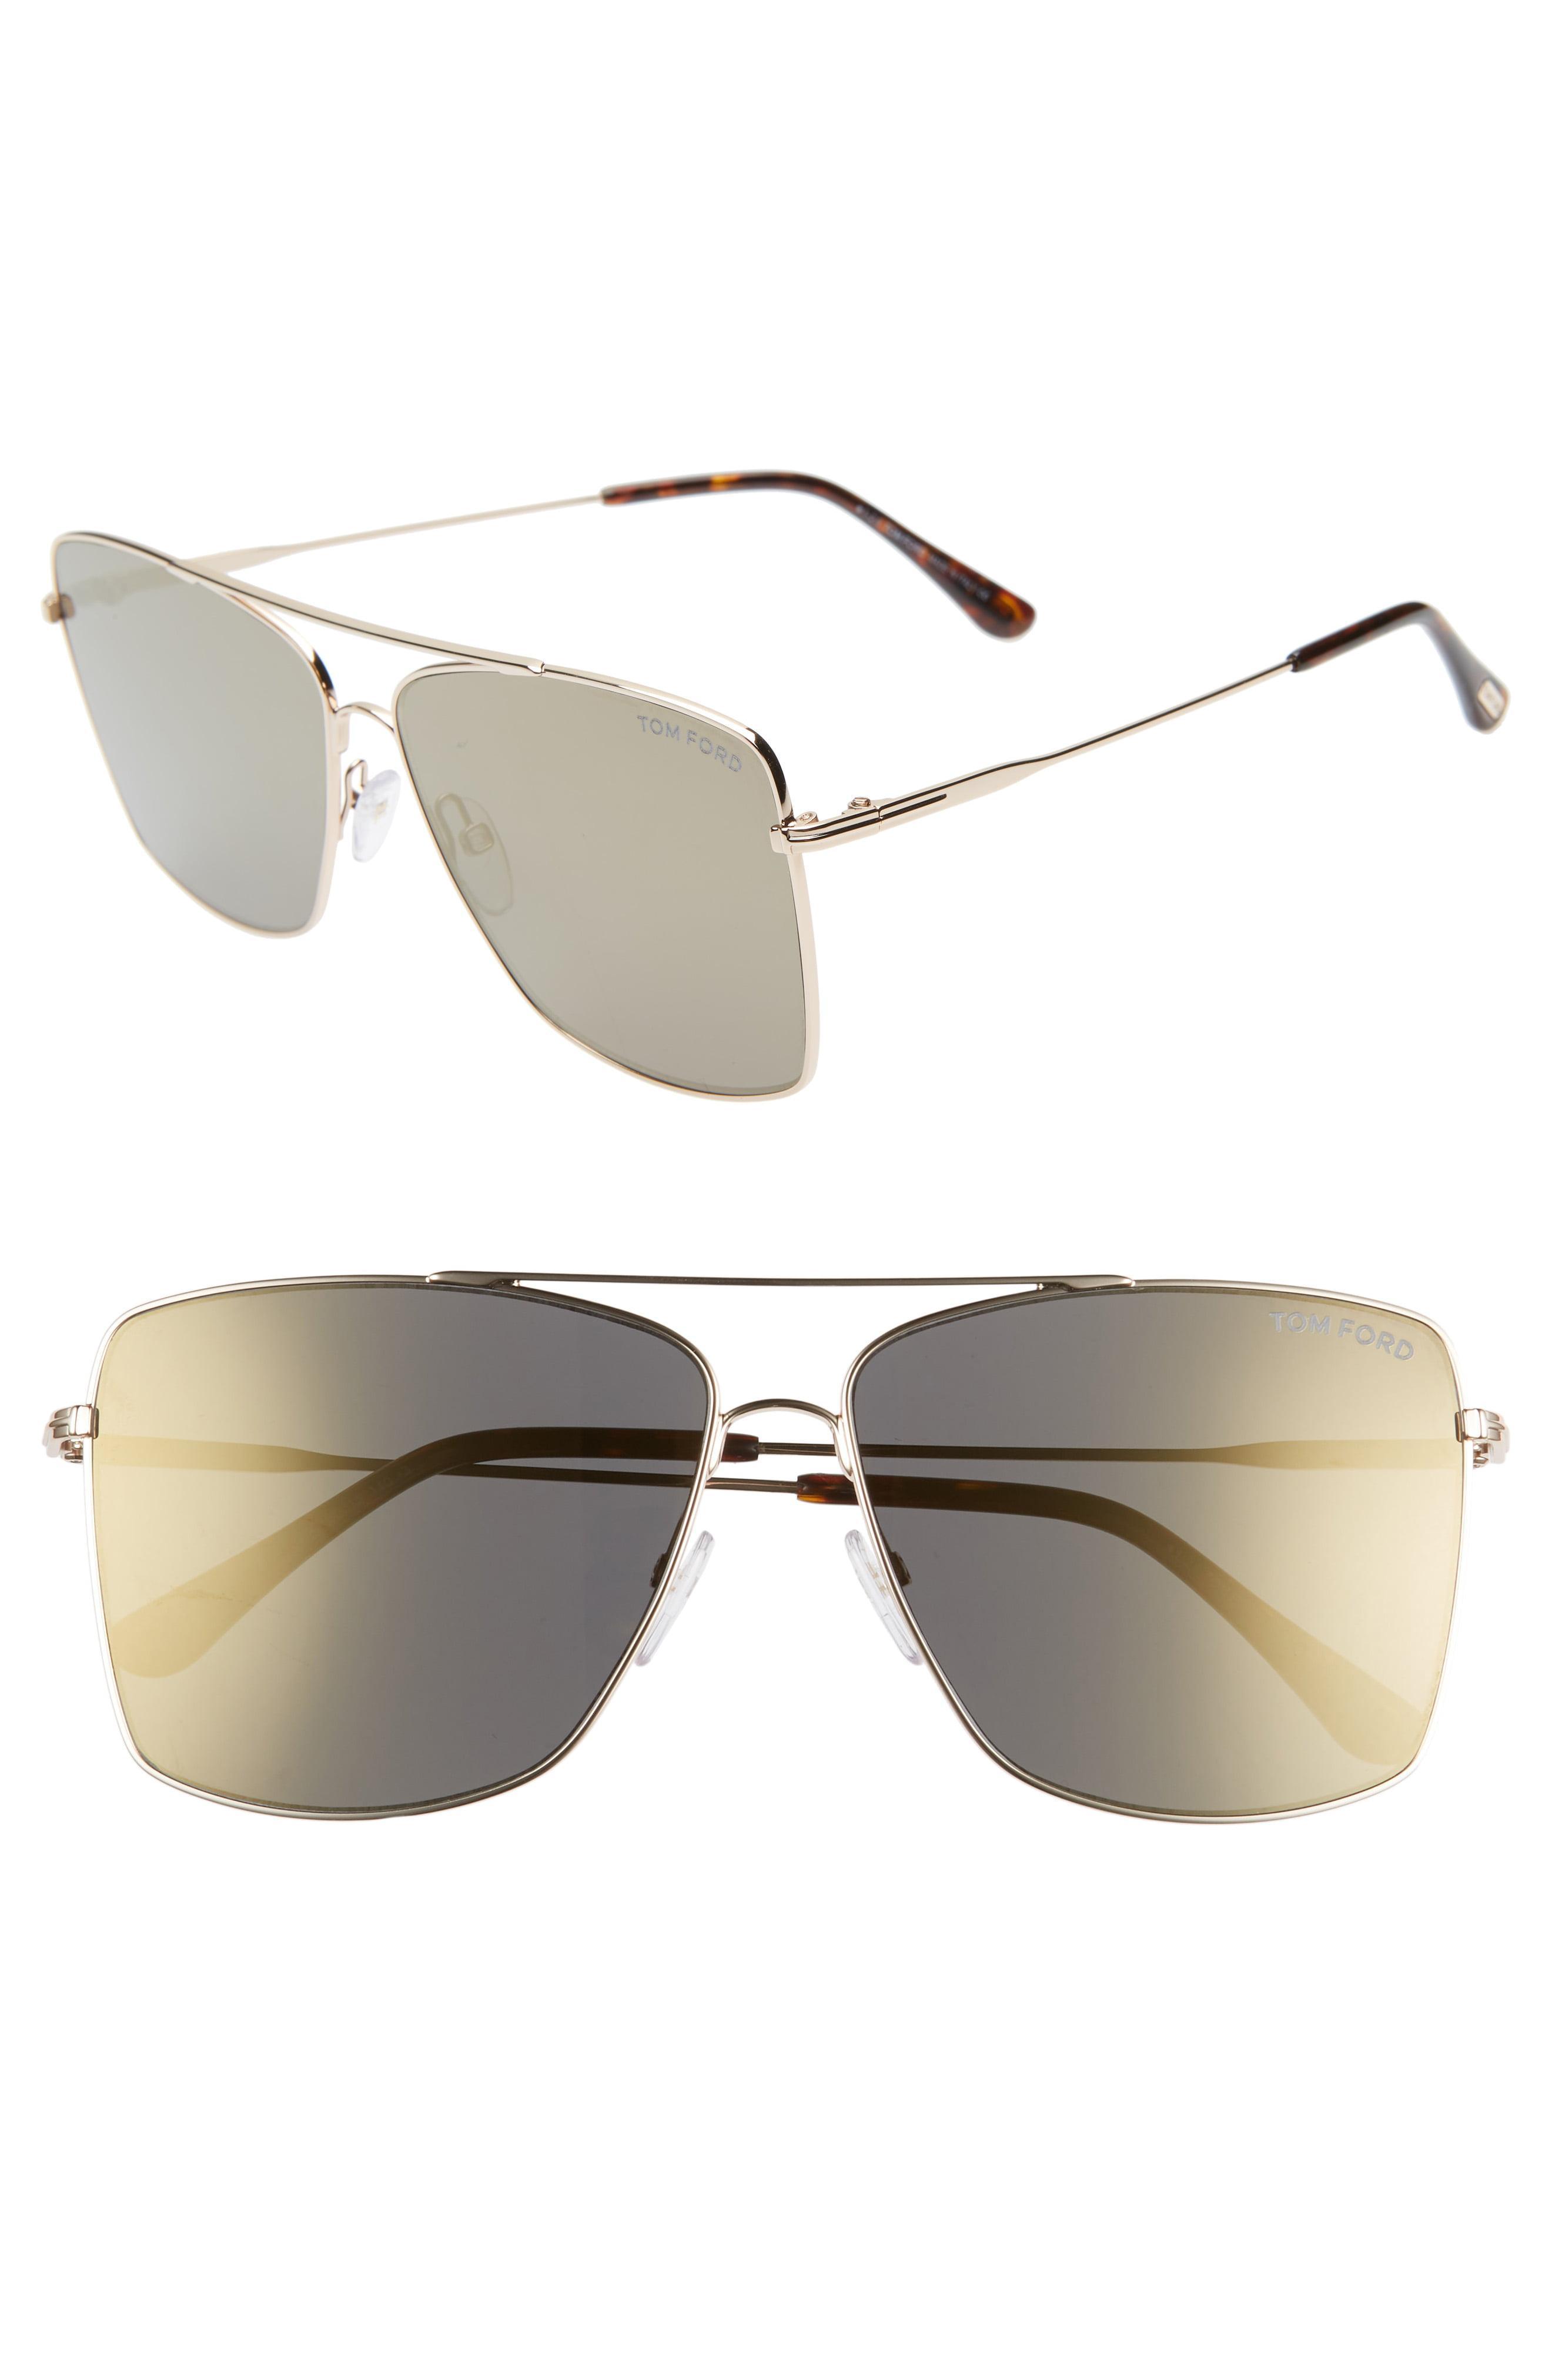 45882cd4109bf Lyst - Tom Ford Magnus 60mm Aviator Sunglasses in Metallic